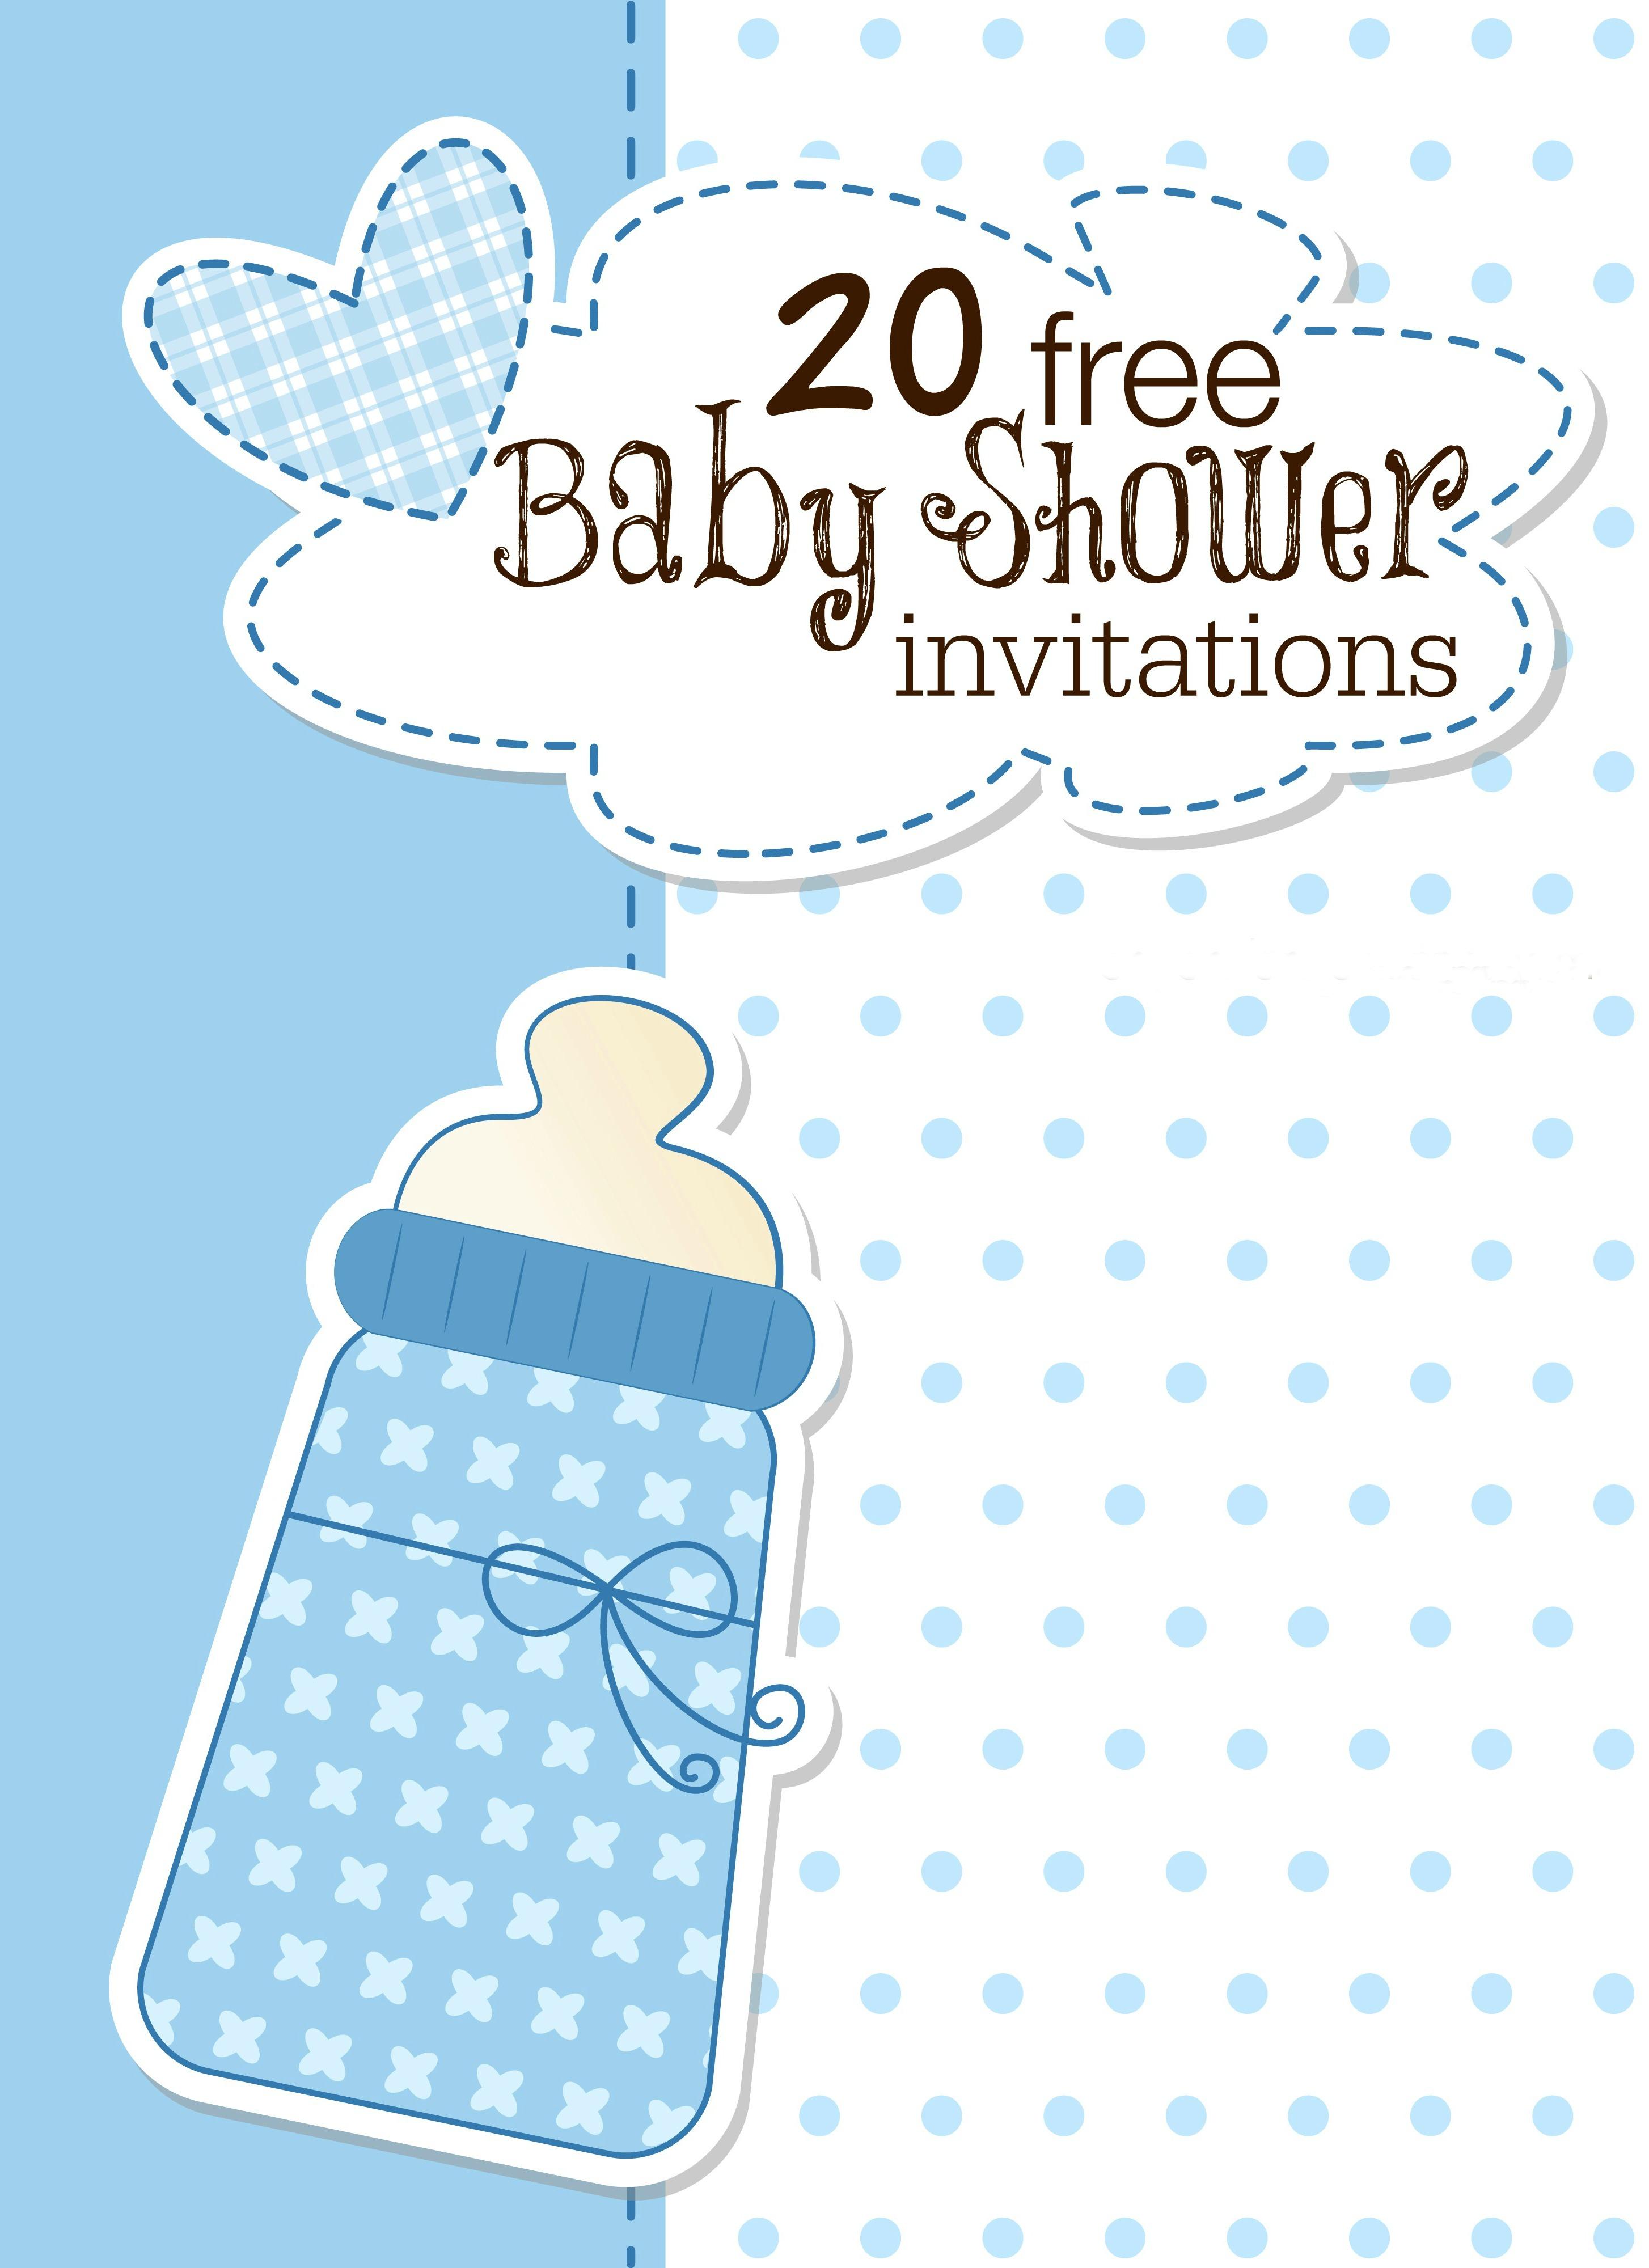 Printable Baby Shower Invitations - Free Printable Elephant Baby Shower Invitations